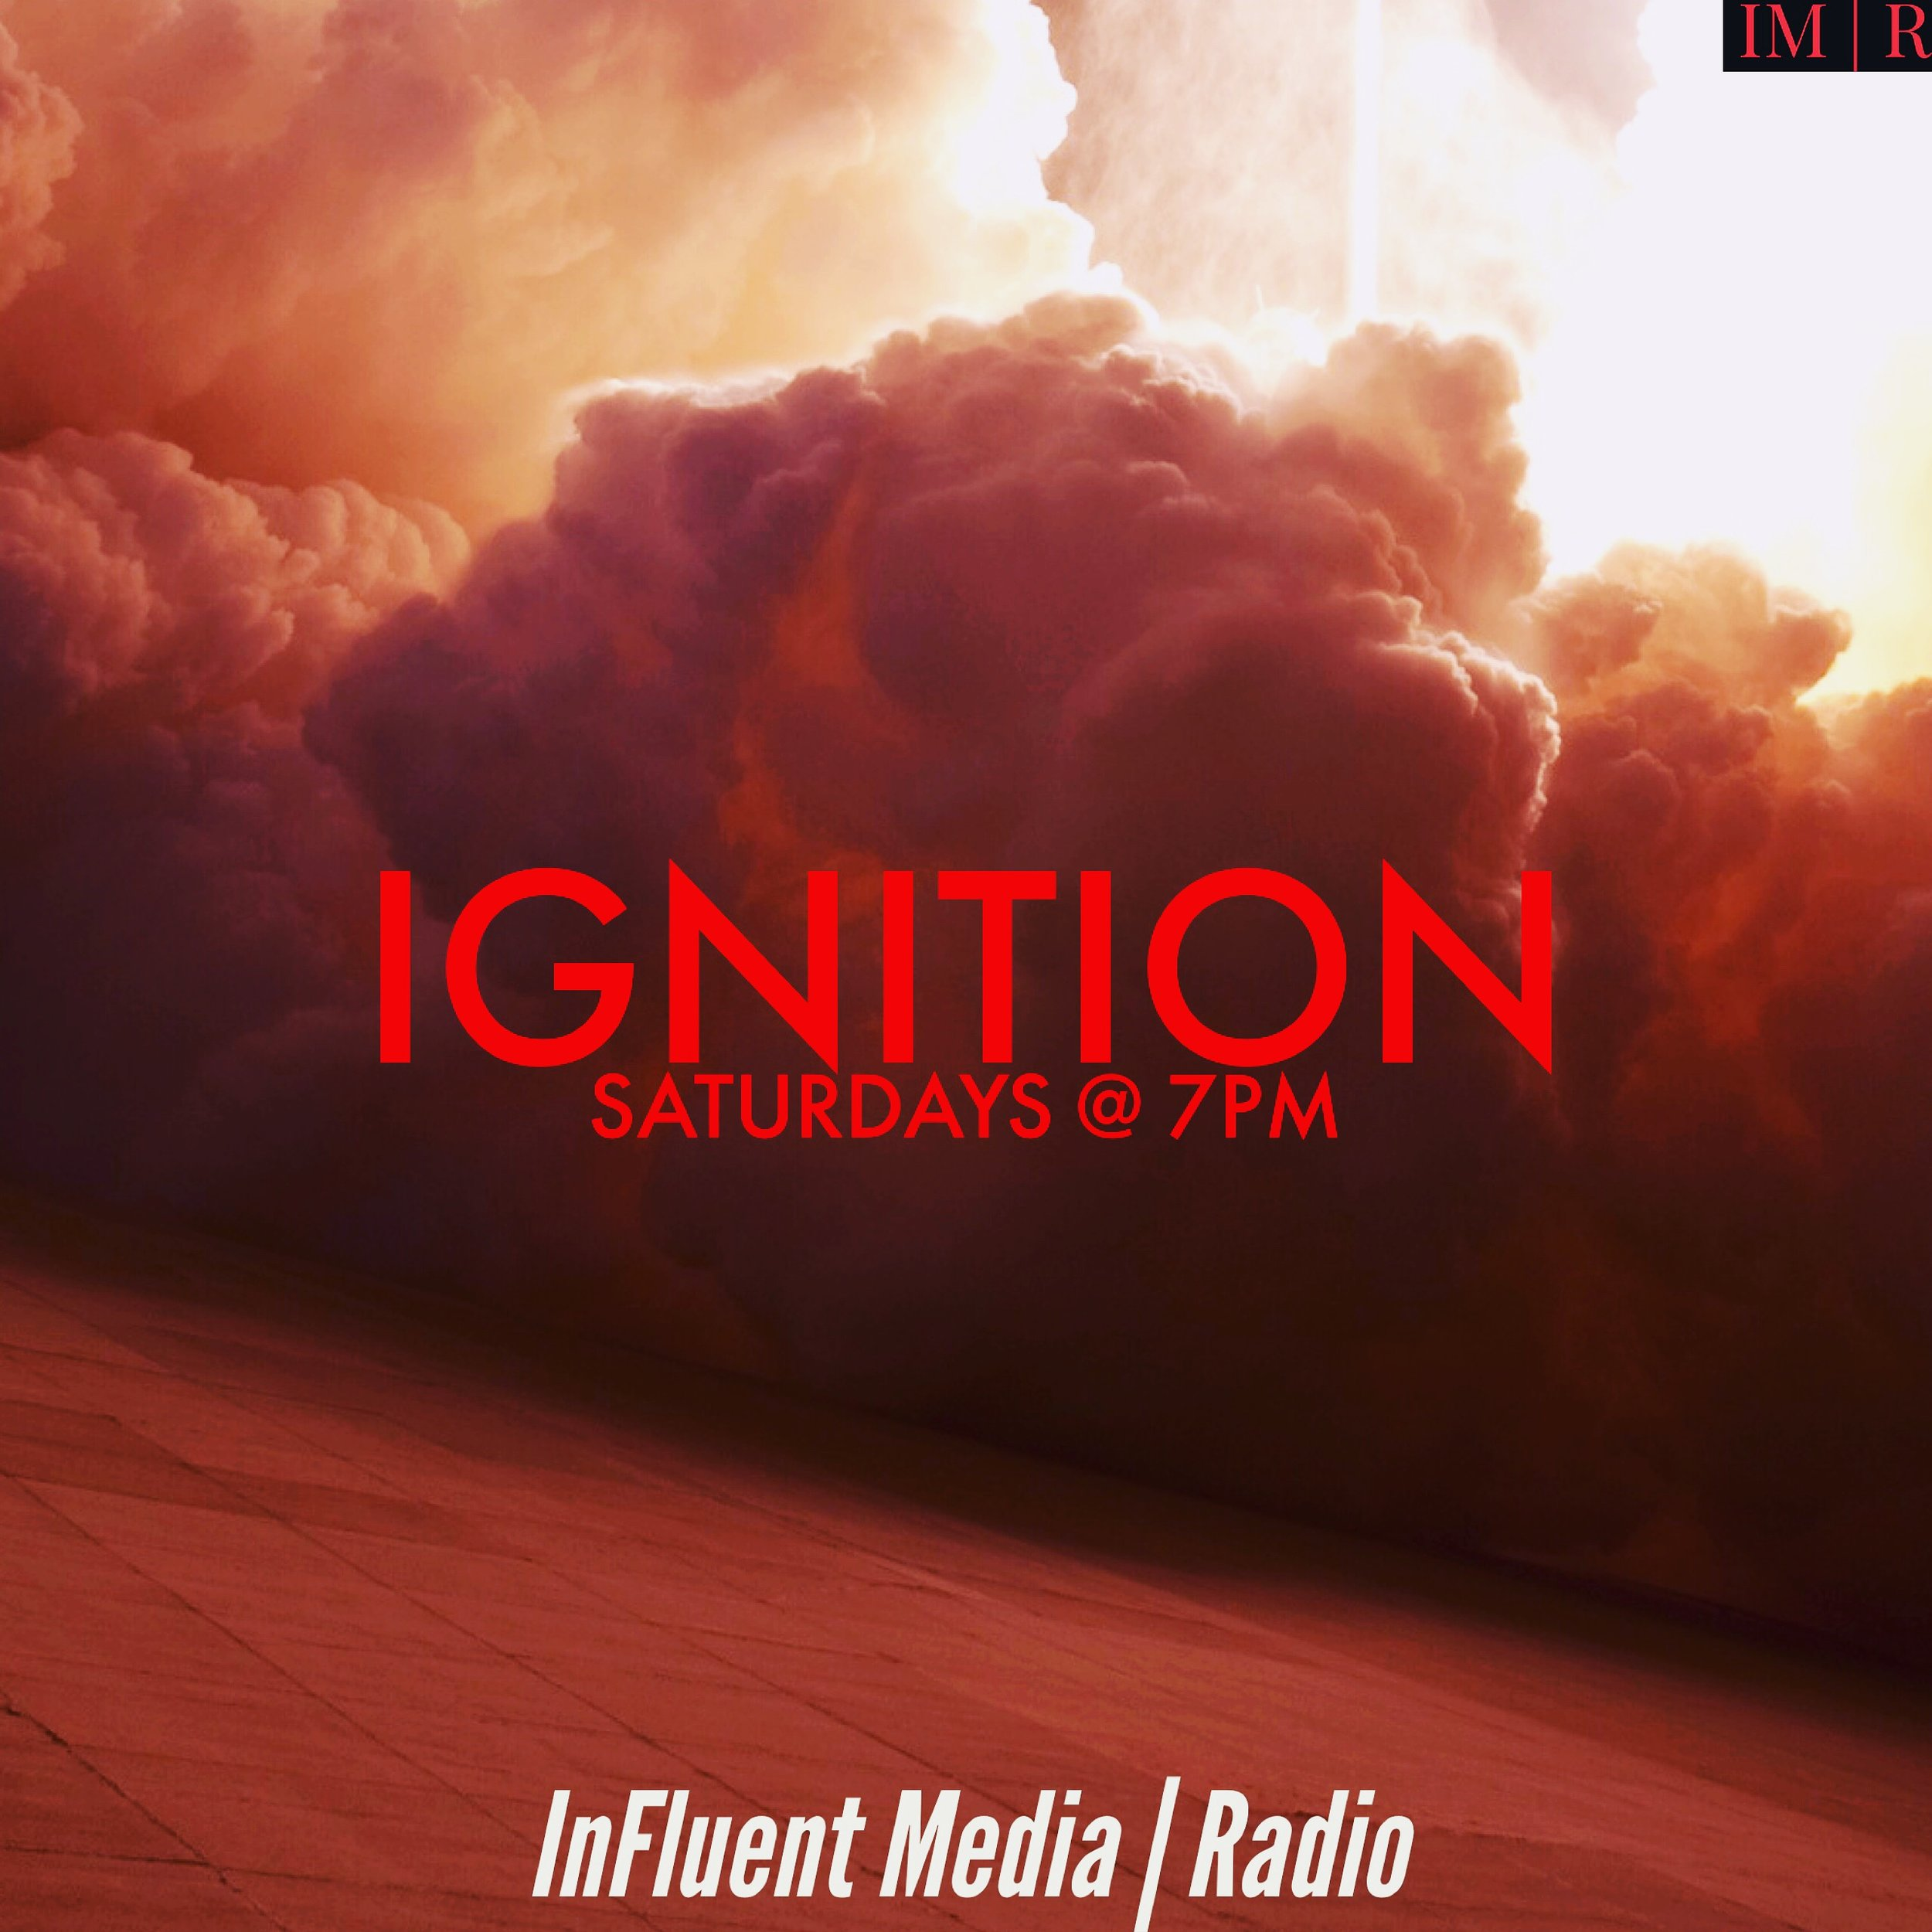 Ignition (InFluent Media Radio Cover Art).JPG